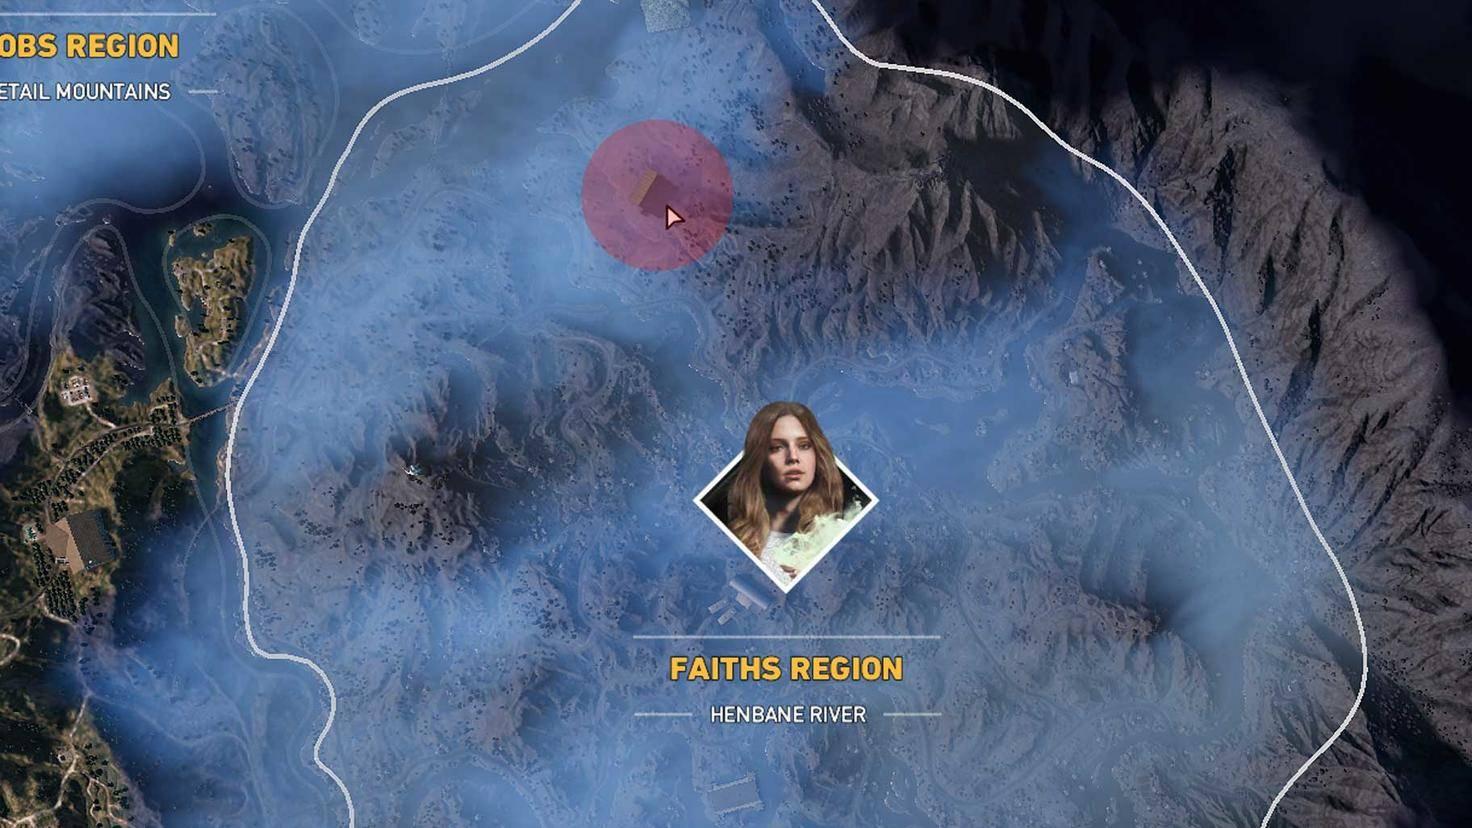 far-cry-5-peaches-finden-screenshot